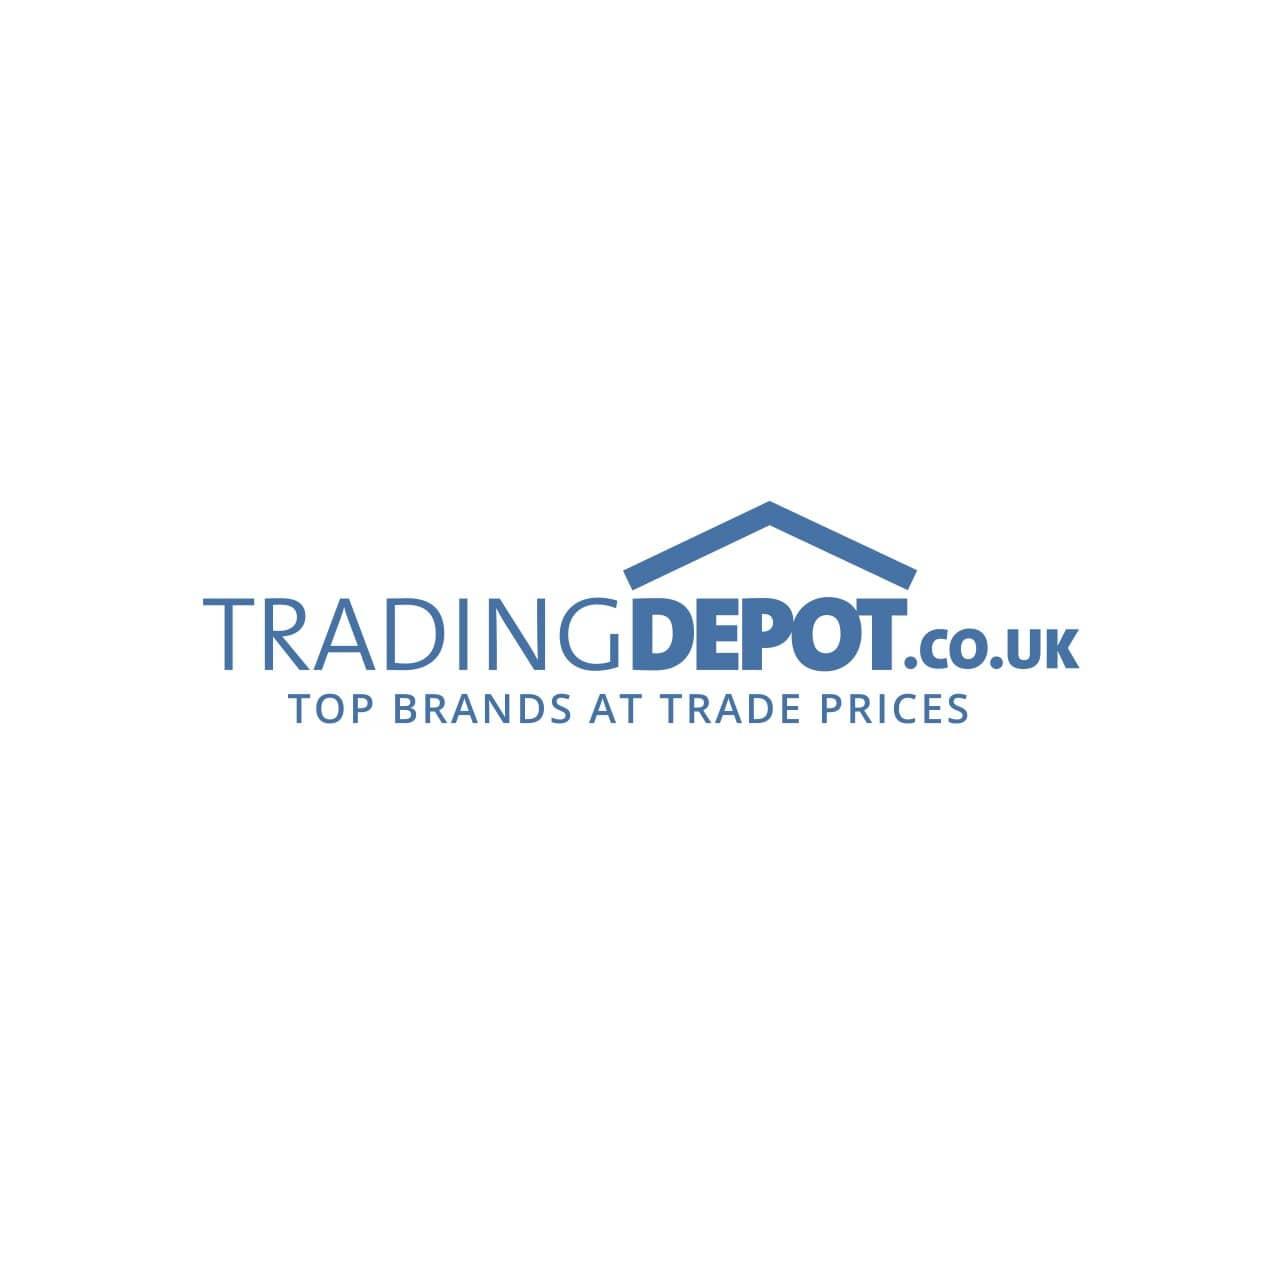 Kent & Stowe Garden Life Digging Spade Stainless Steel - K/S70100700